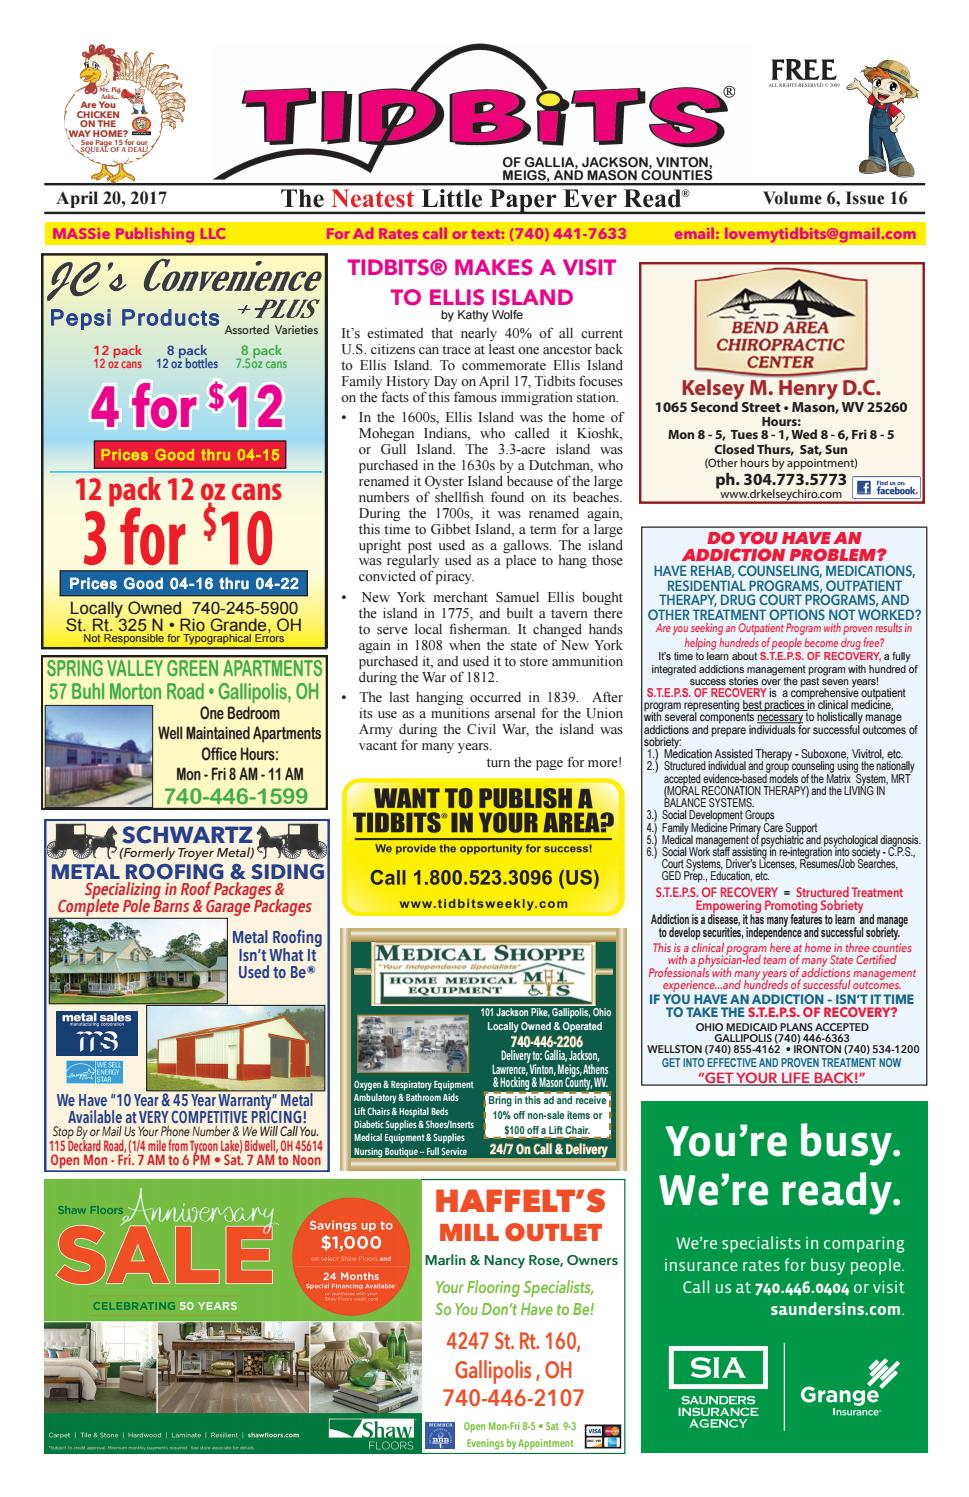 Tidbits Of Gallia Jackson Vinton Meigs Mason Counties V6 Issue 16 By Marilyn Massie Issuu